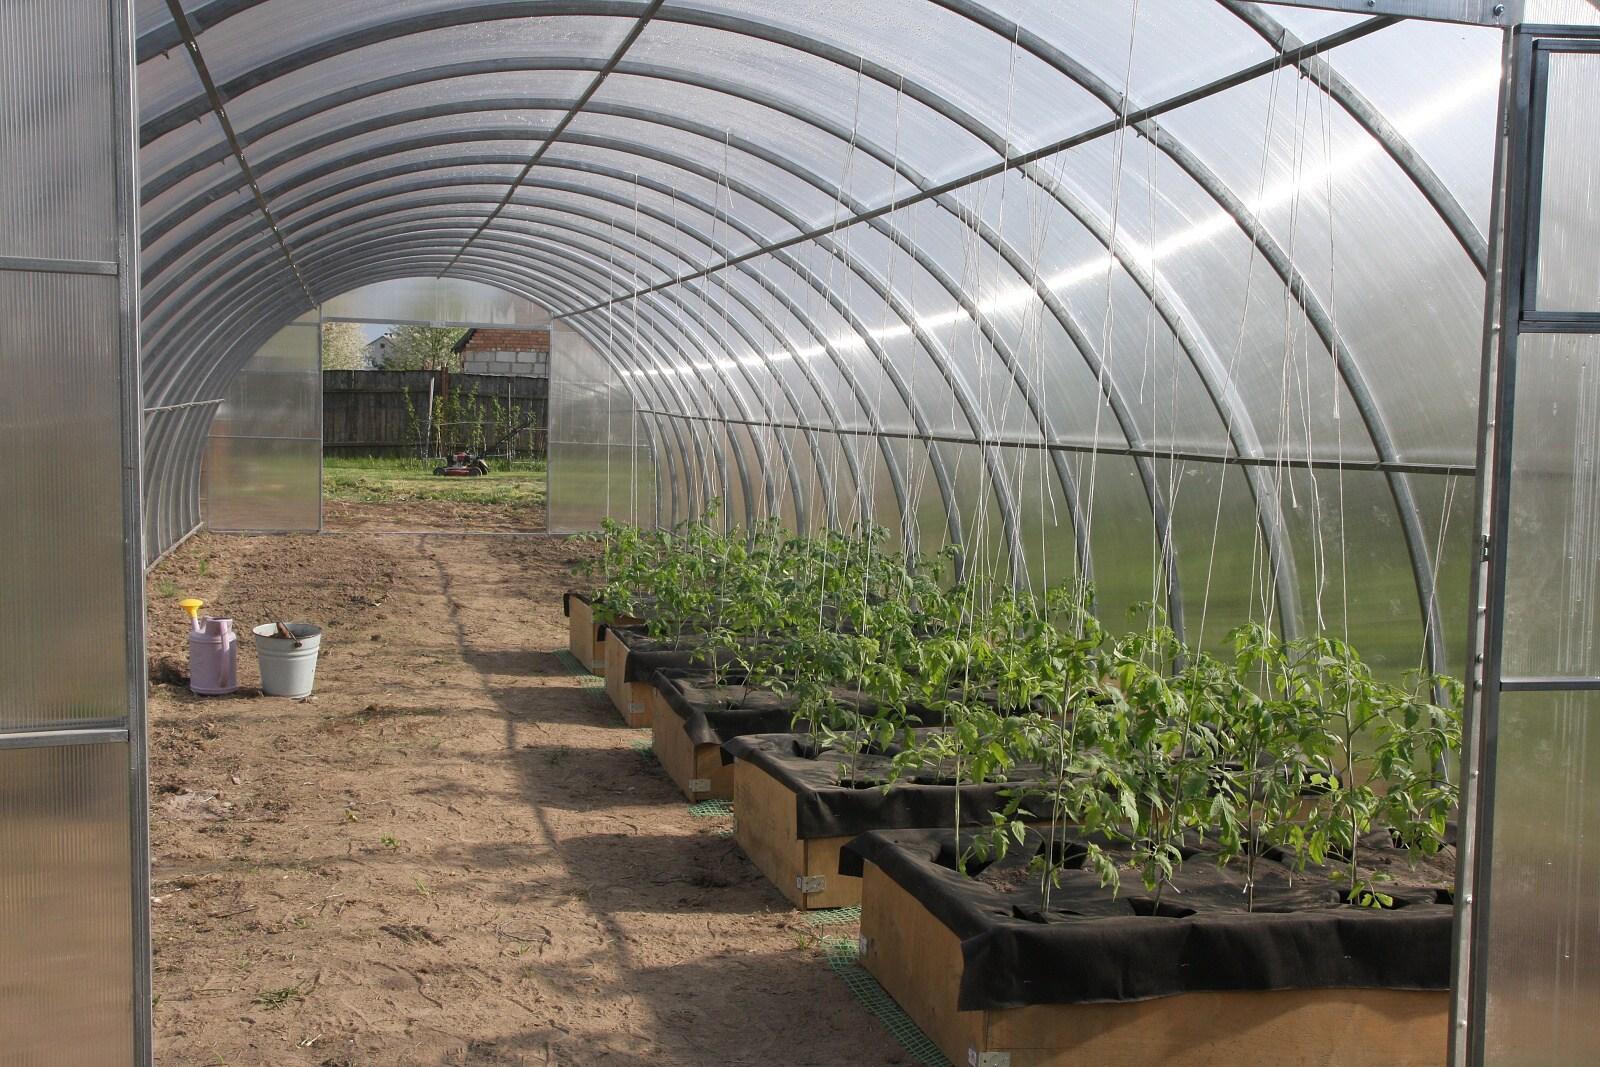 skleník LANITPLAST URAL 4x8 m PC 10 mm